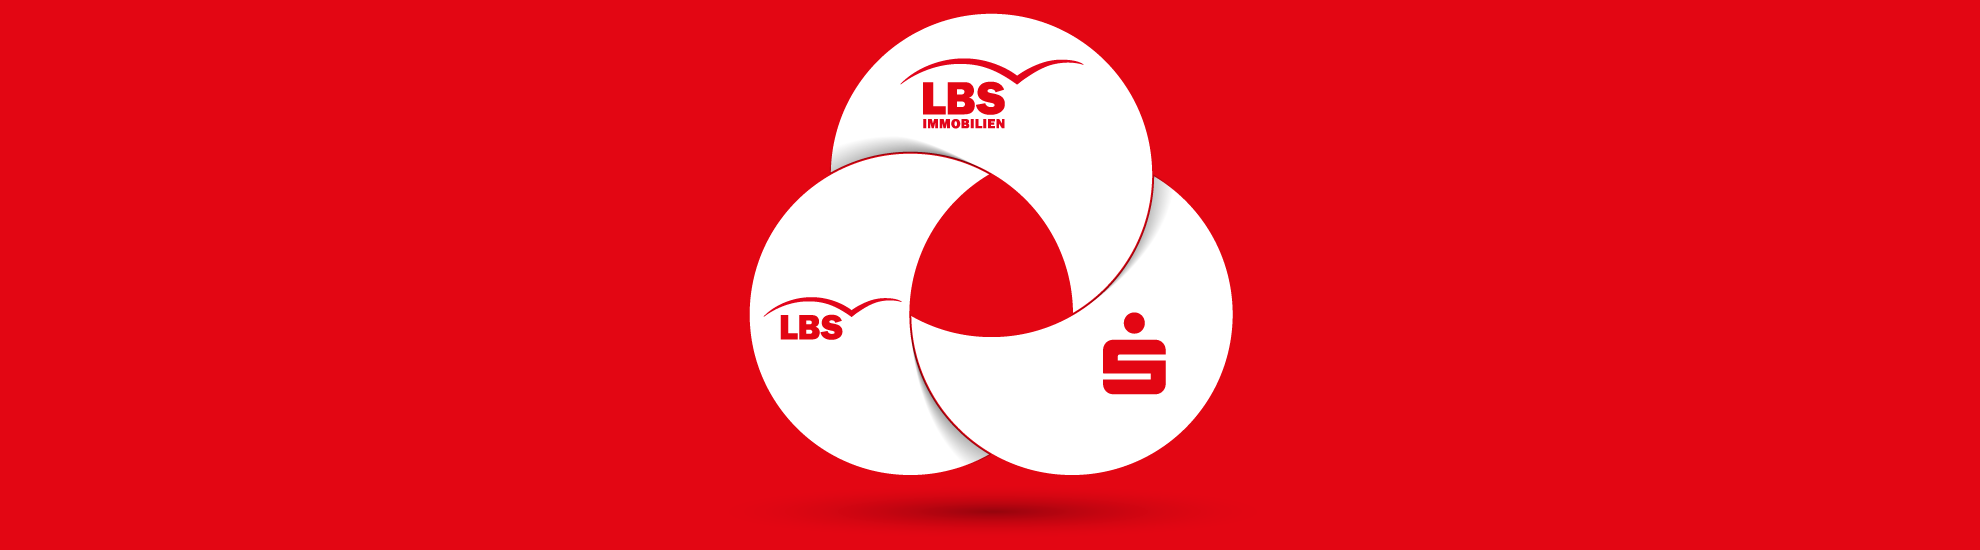 LBS Immobilien Vertriebspartner